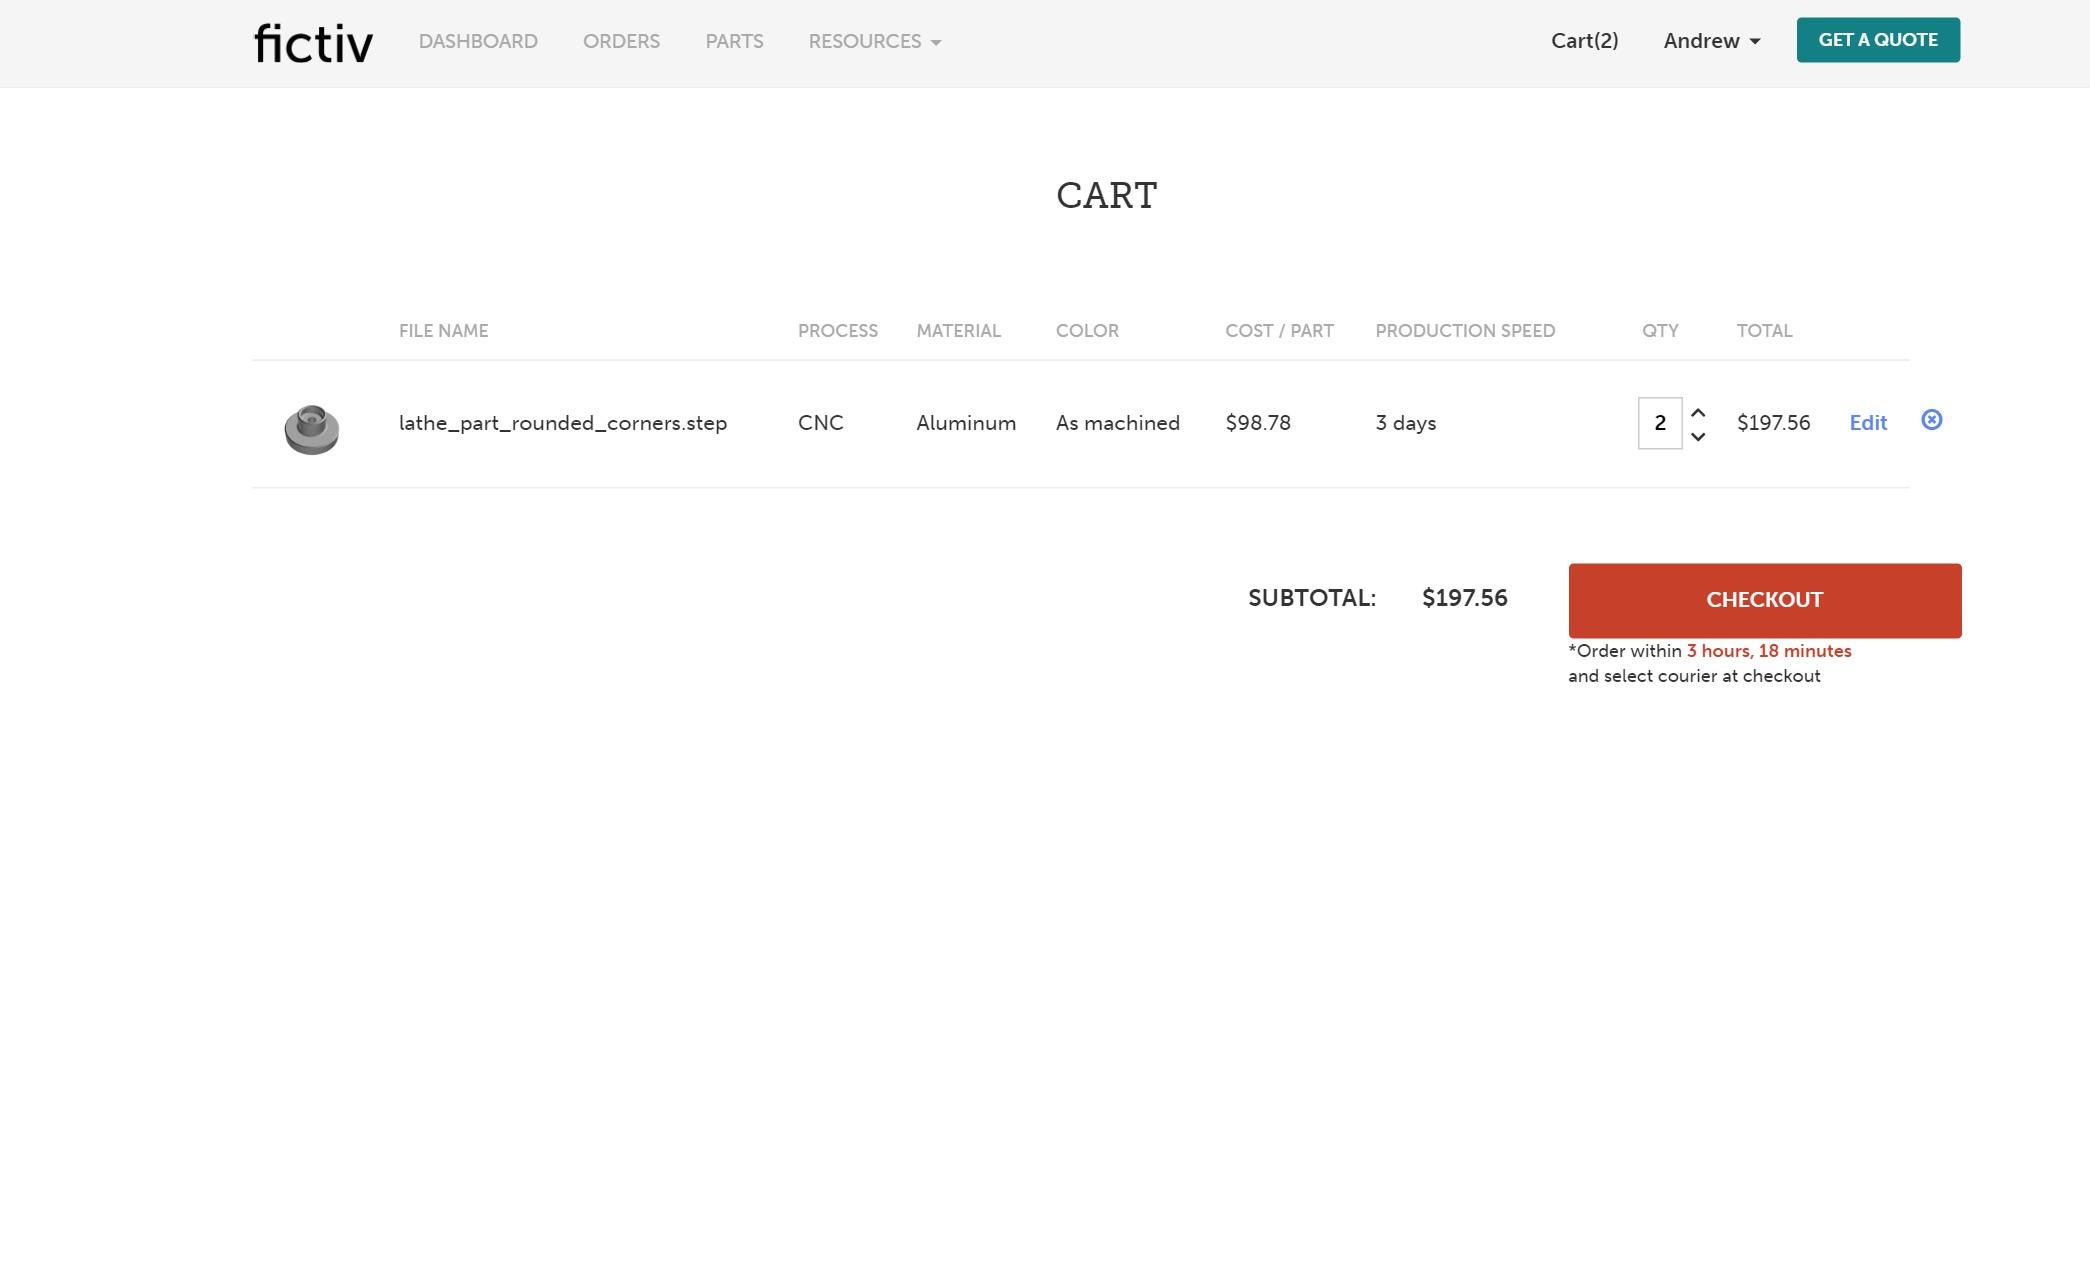 fictiv platform cart page